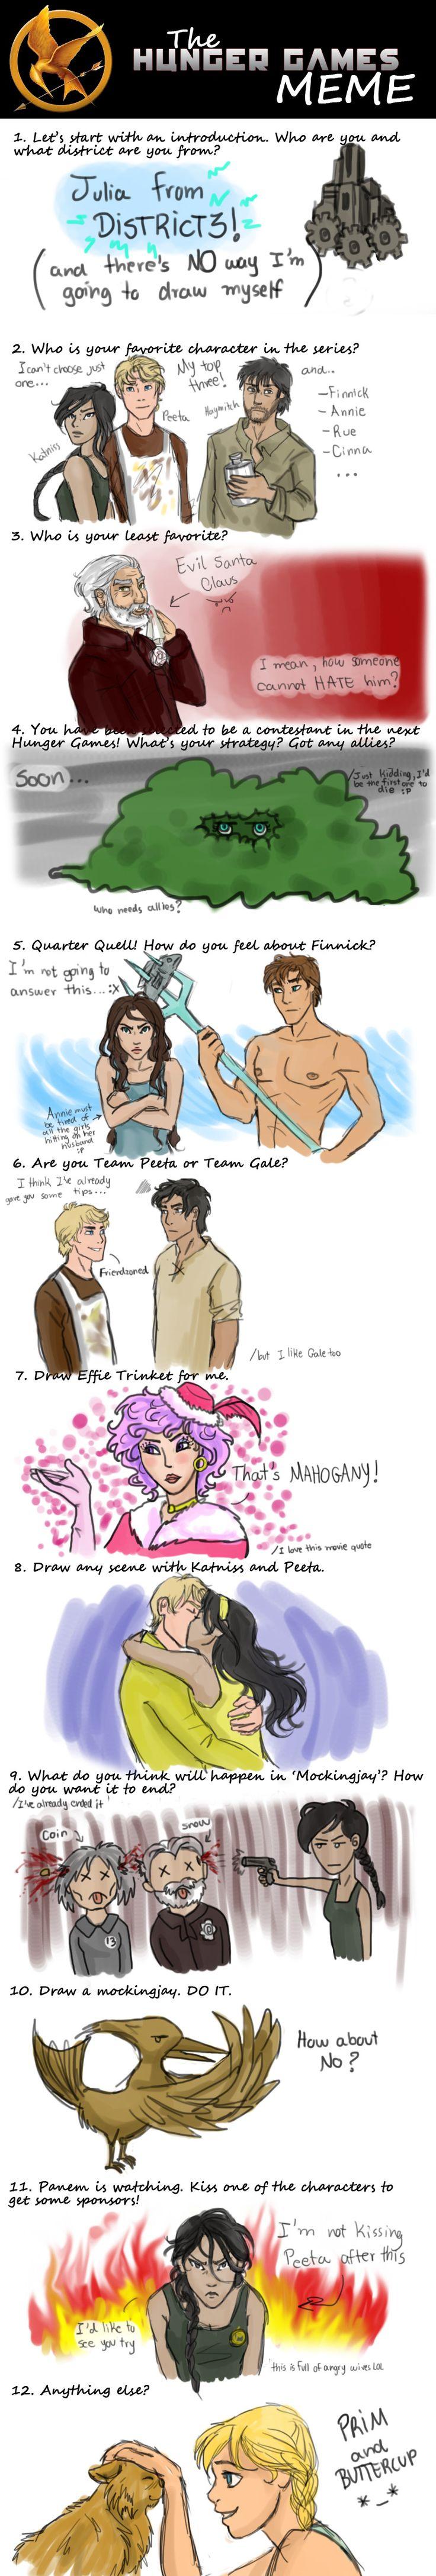 My Hunger Games Meme by juliajm15.deviantart.com on @deviantART